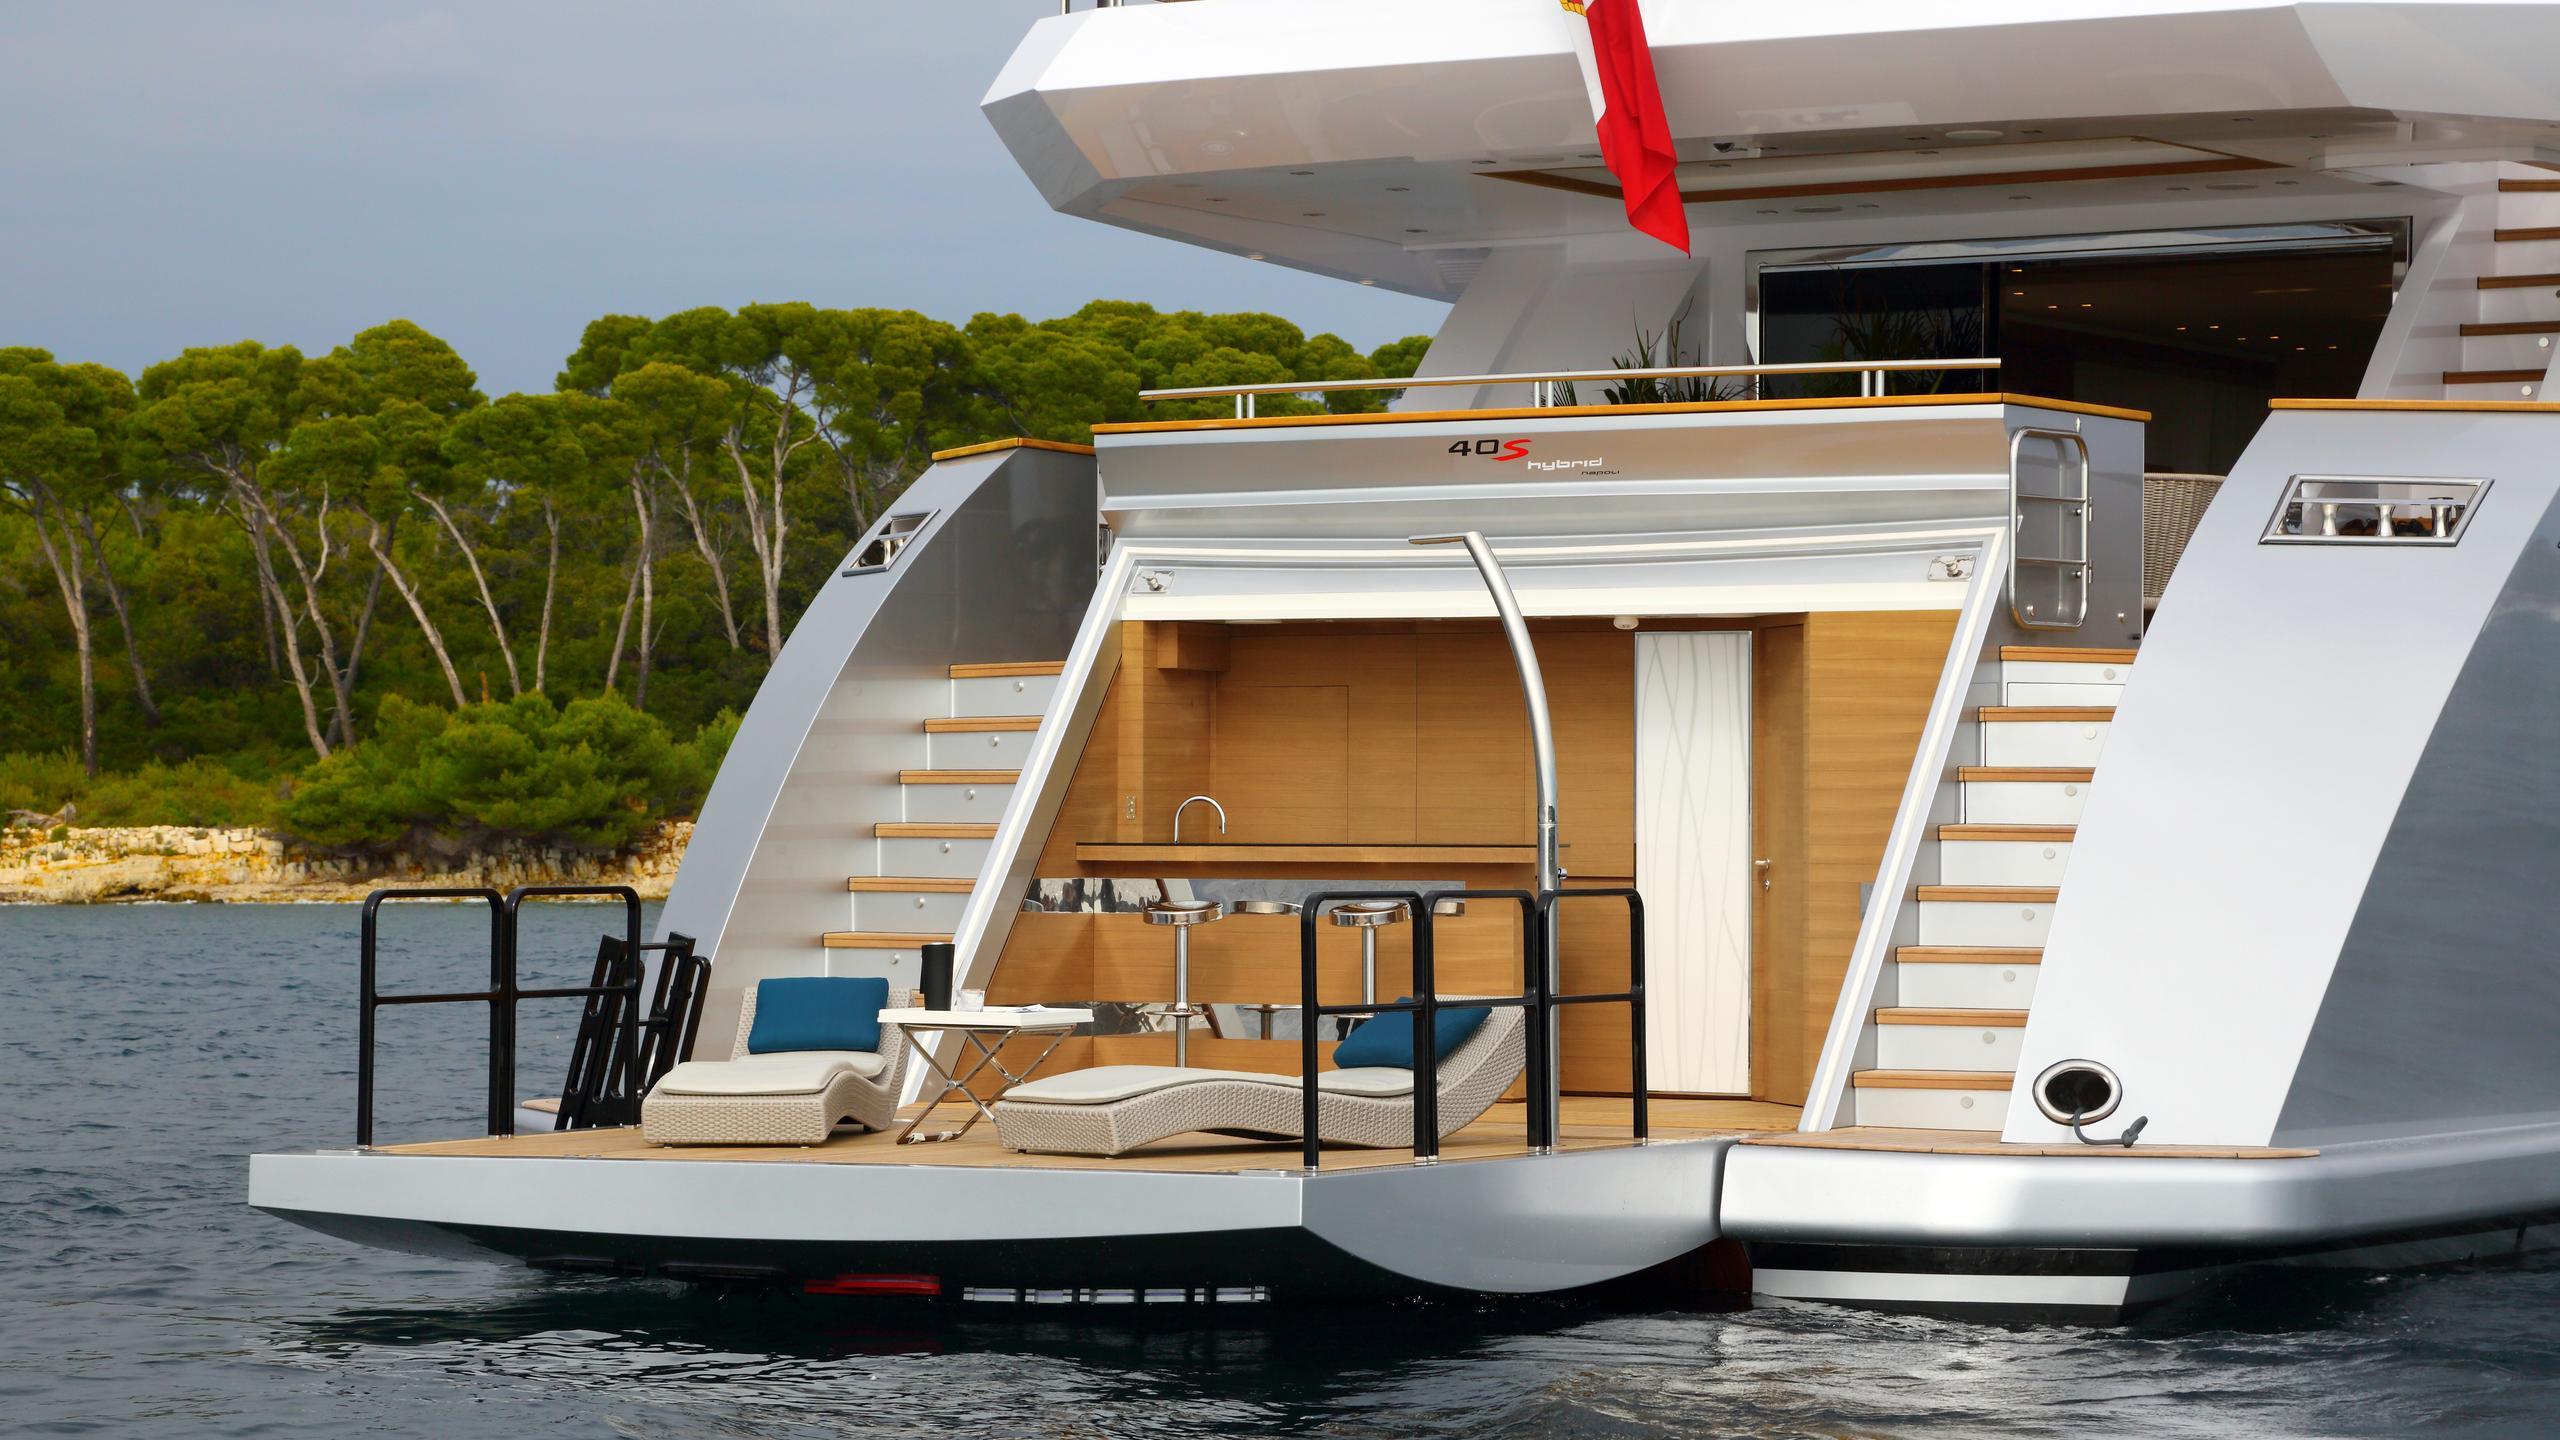 columbus-40S-hybrid-yacht-beach-club